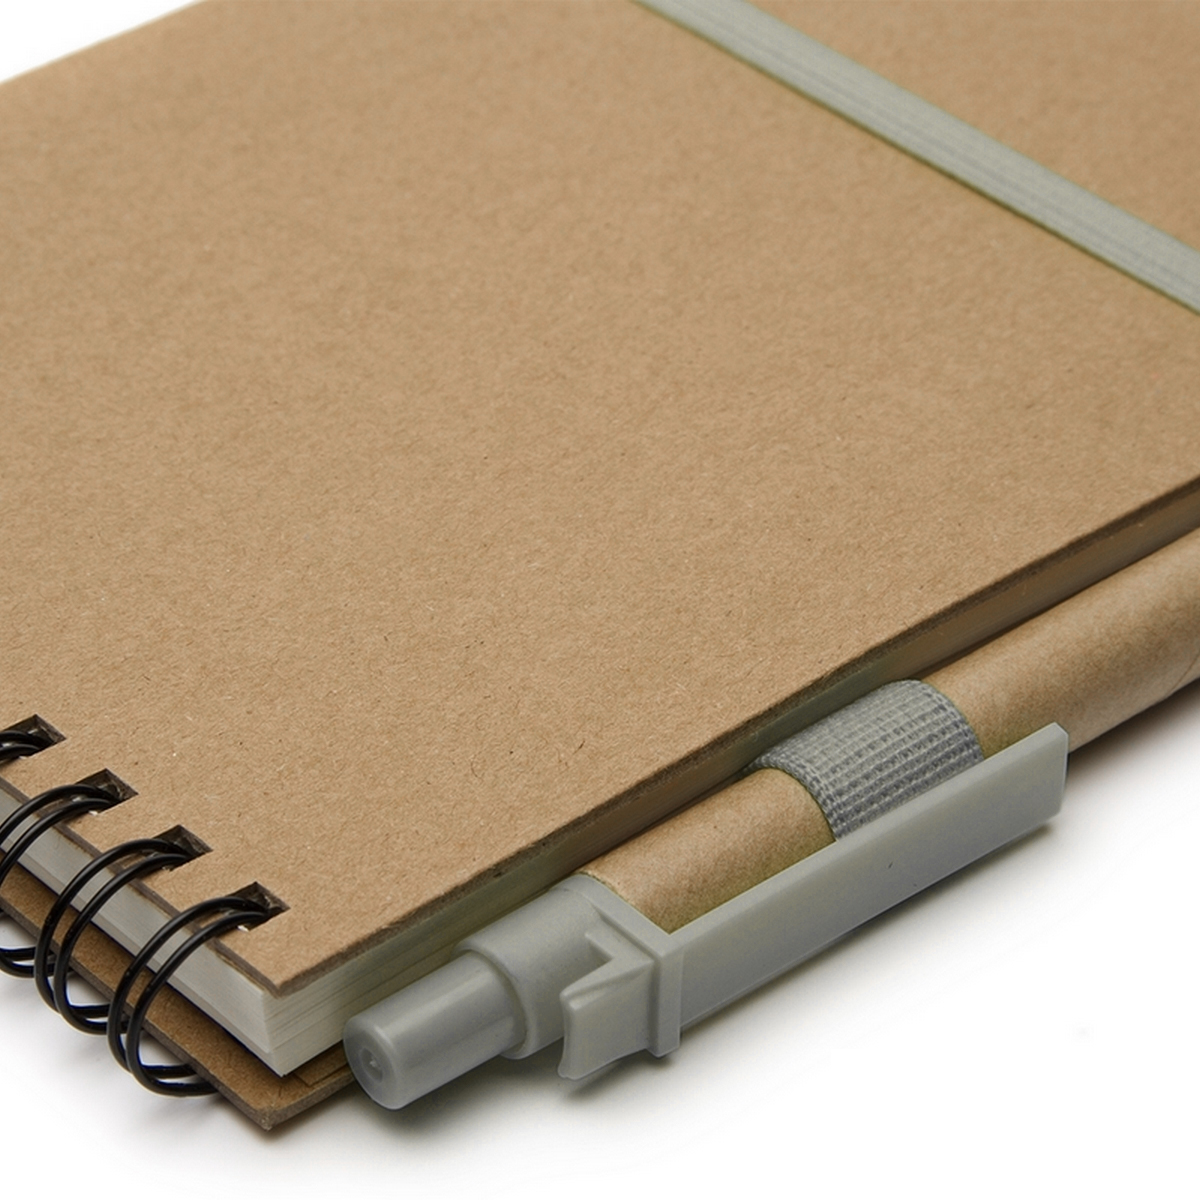 Cuaderno ECO1 Espiralado A6 C/boligrafo